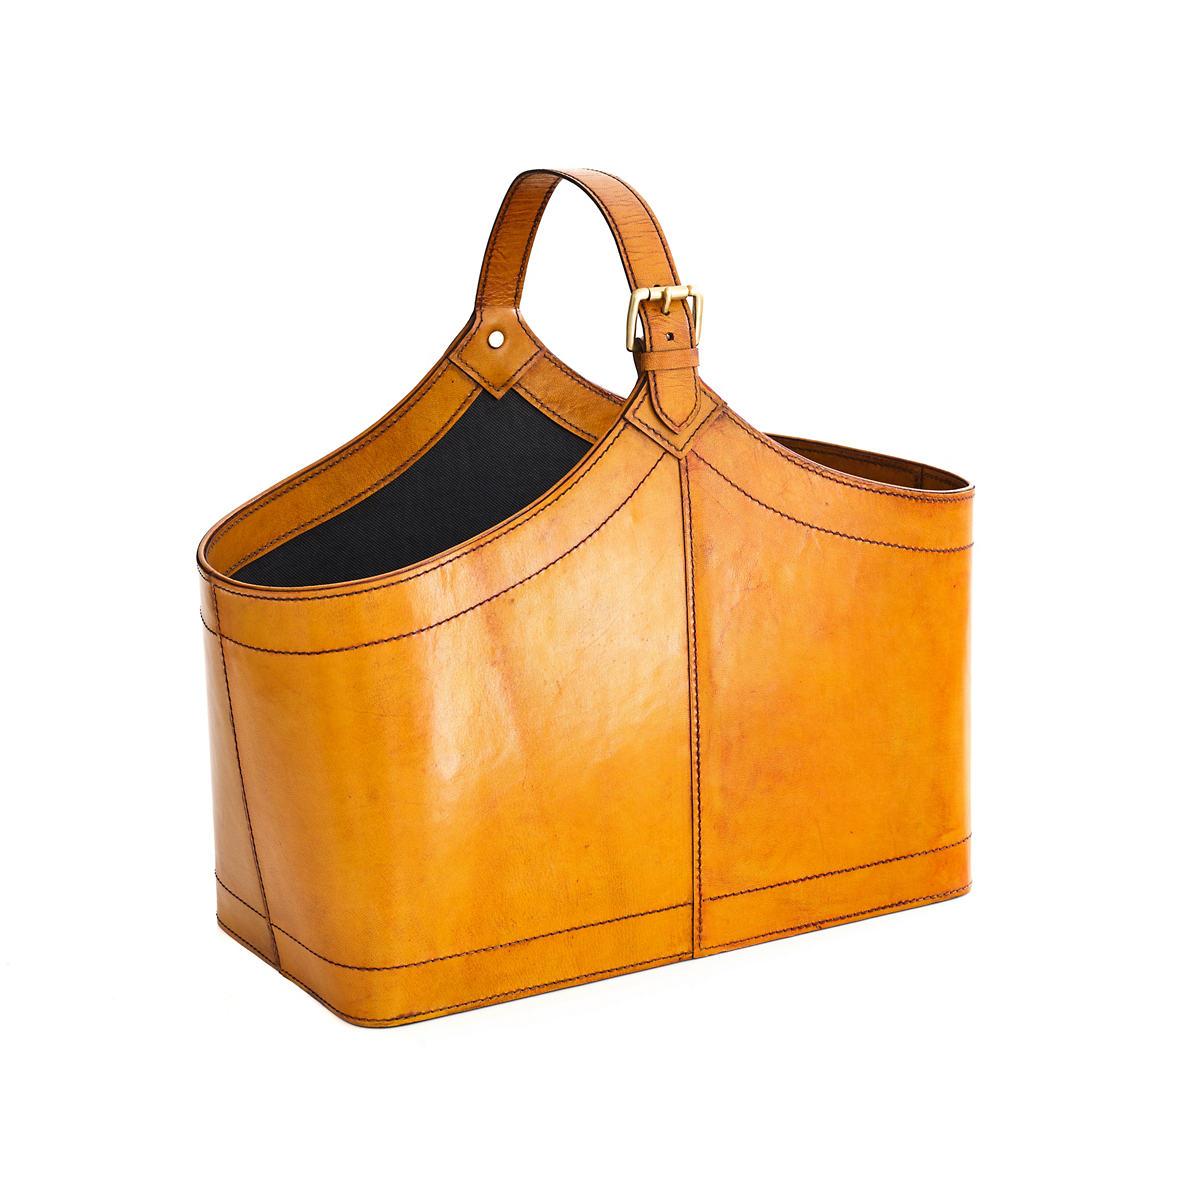 Charles Leather Ochre Basket